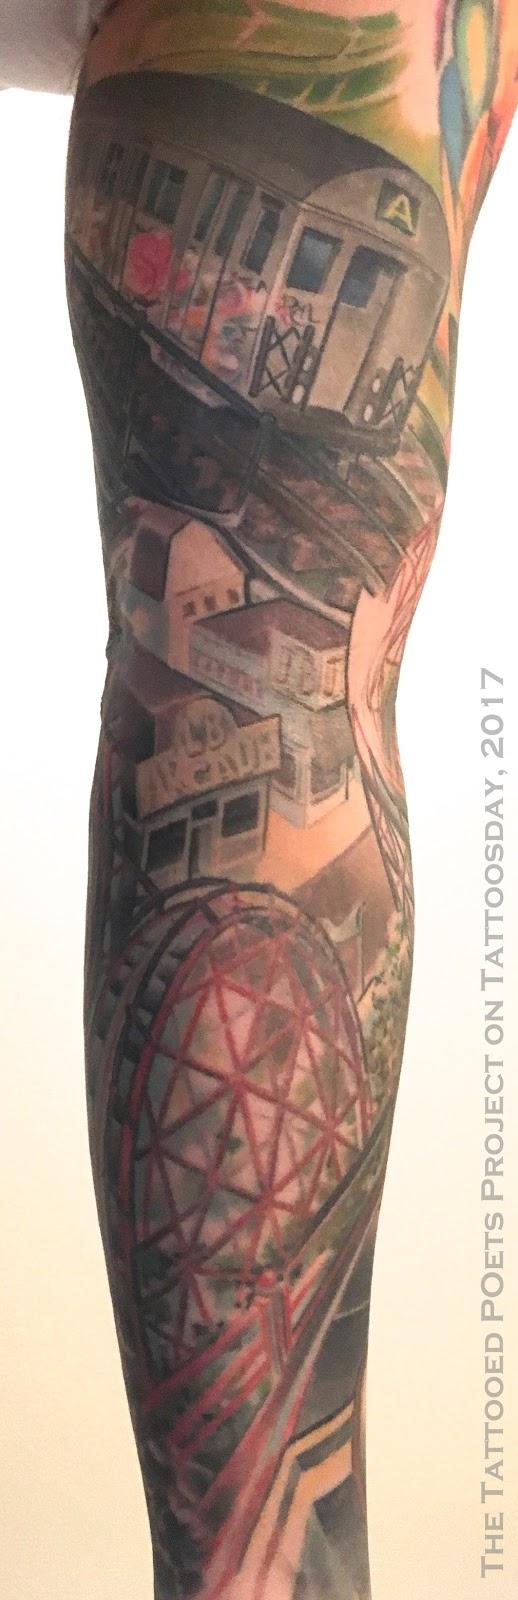 Ryan Black's Sleeve Recalls the Rockaways (The Tattooed Poets Project)